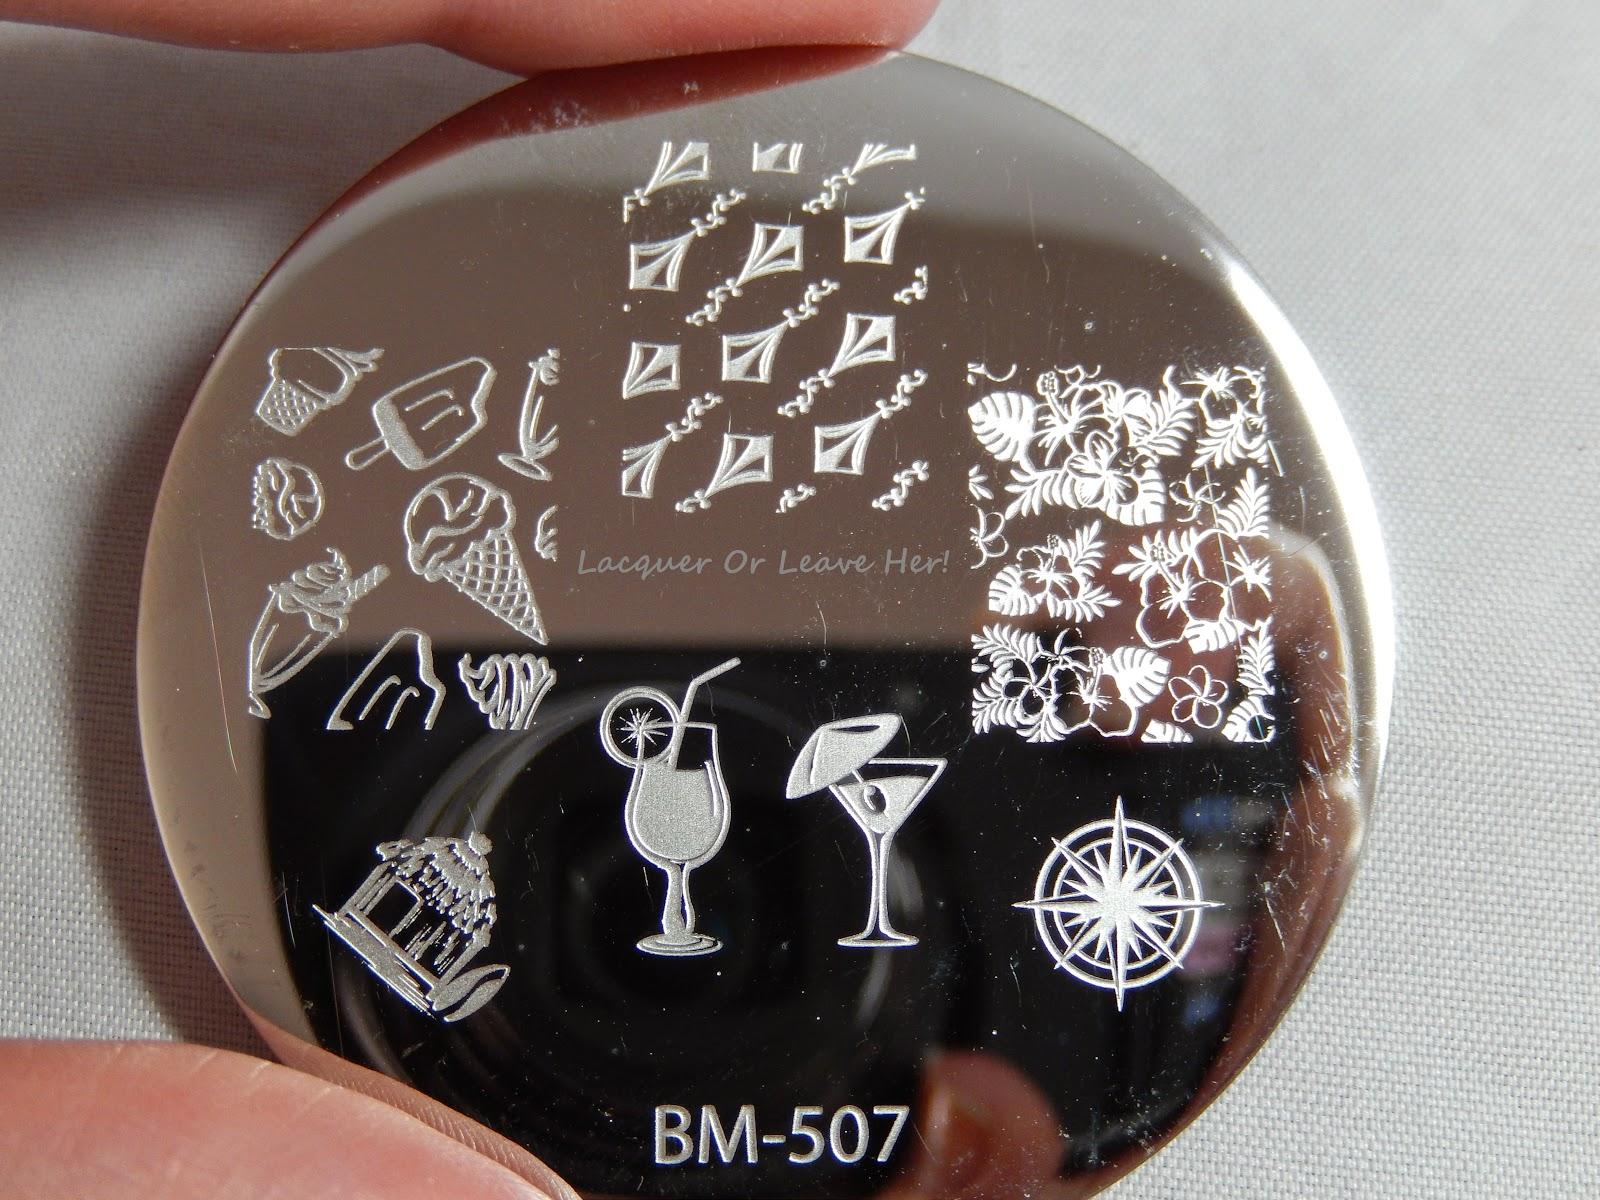 BM-507